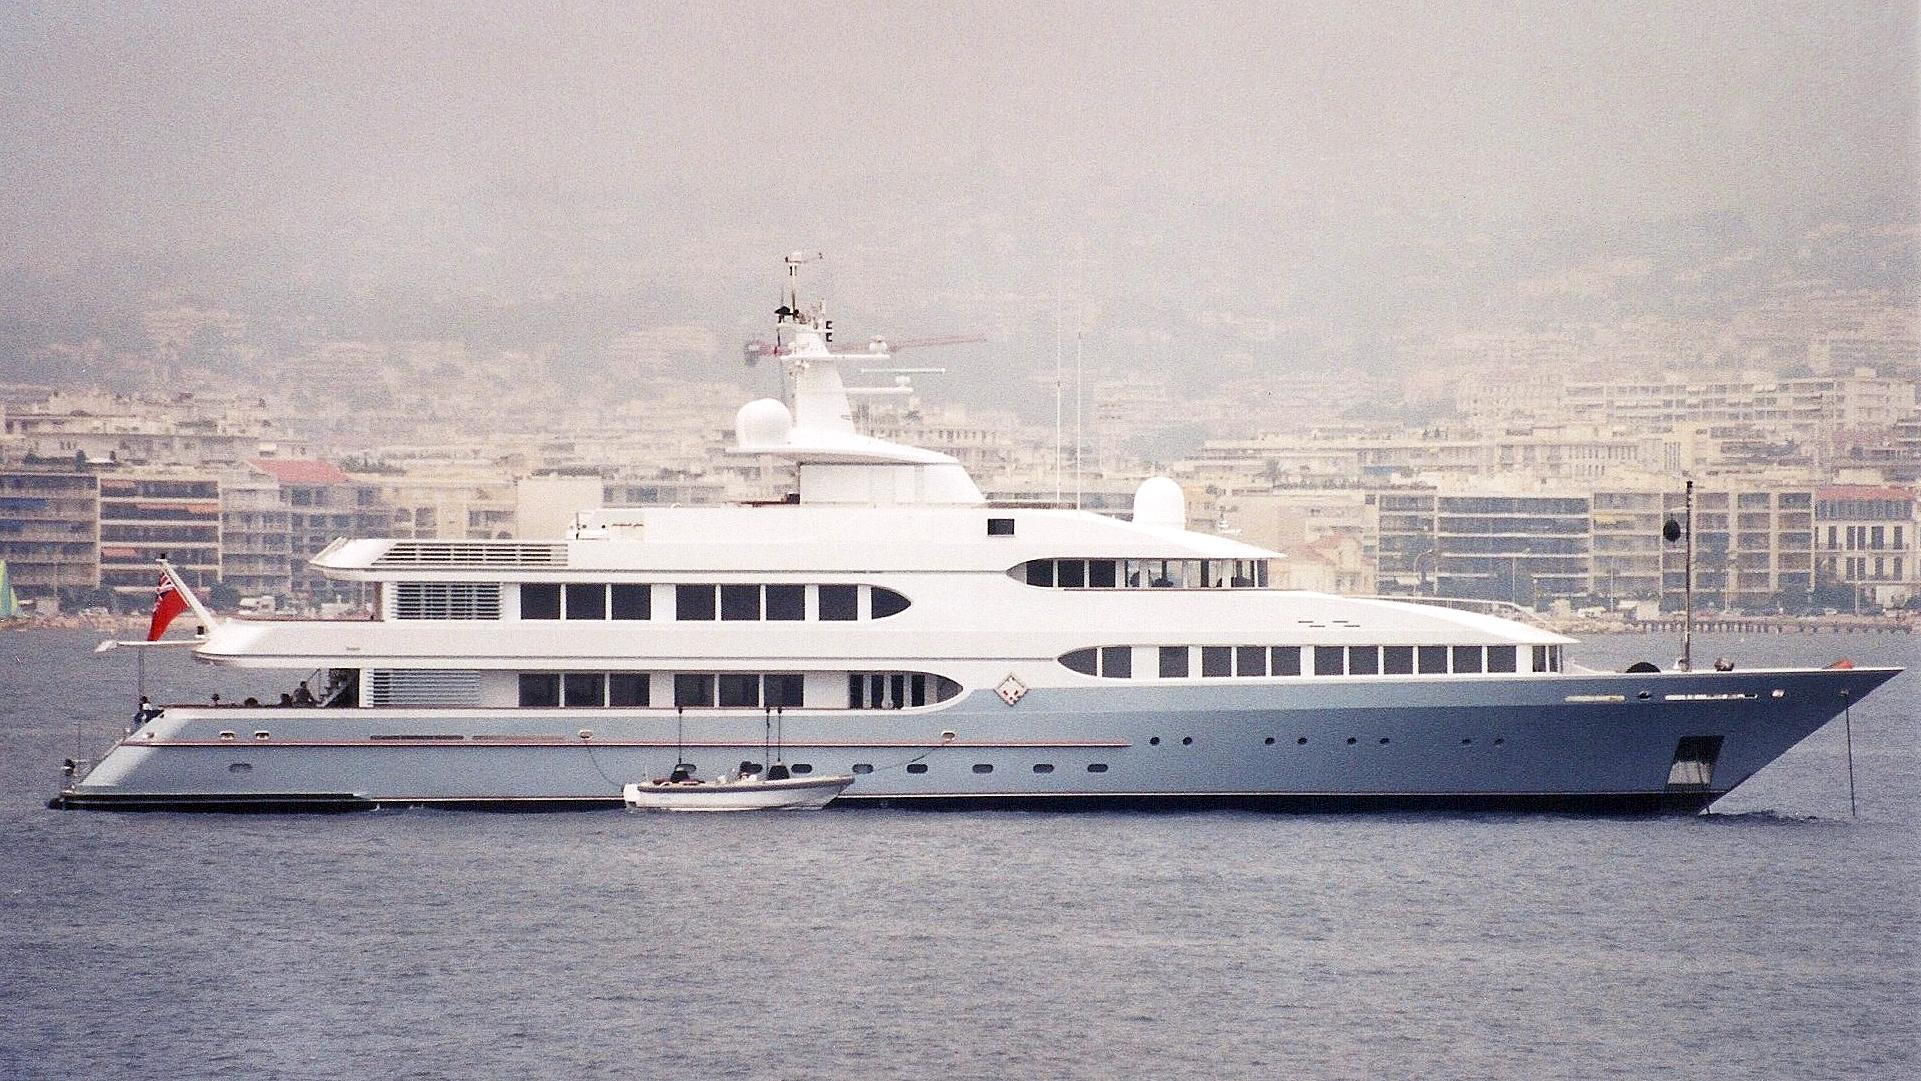 samax-motor-yacht-feadship-1996-55m-profile-1